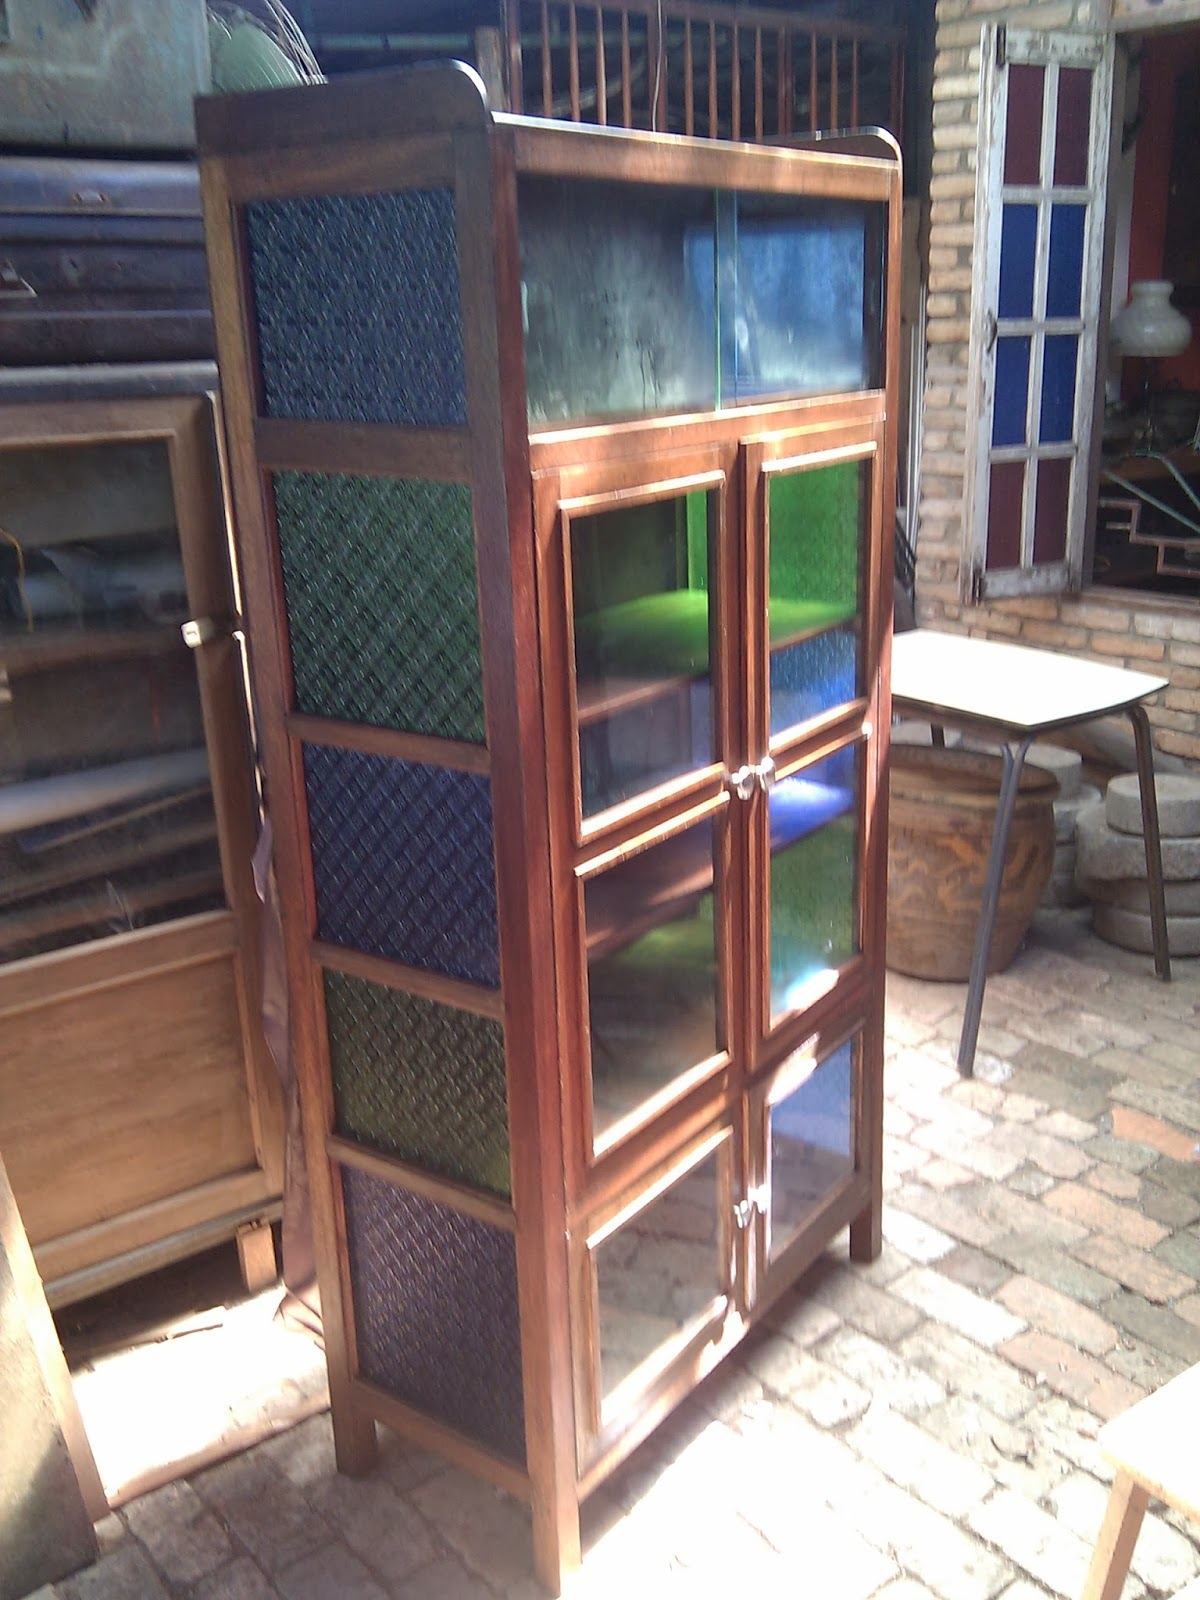 Selepas baikpulih / After Restoration. Experienced in restoration works on  old / antique furniture - Barang Lama :: A Blog Of Antique Furniture Restoration, And Vintage